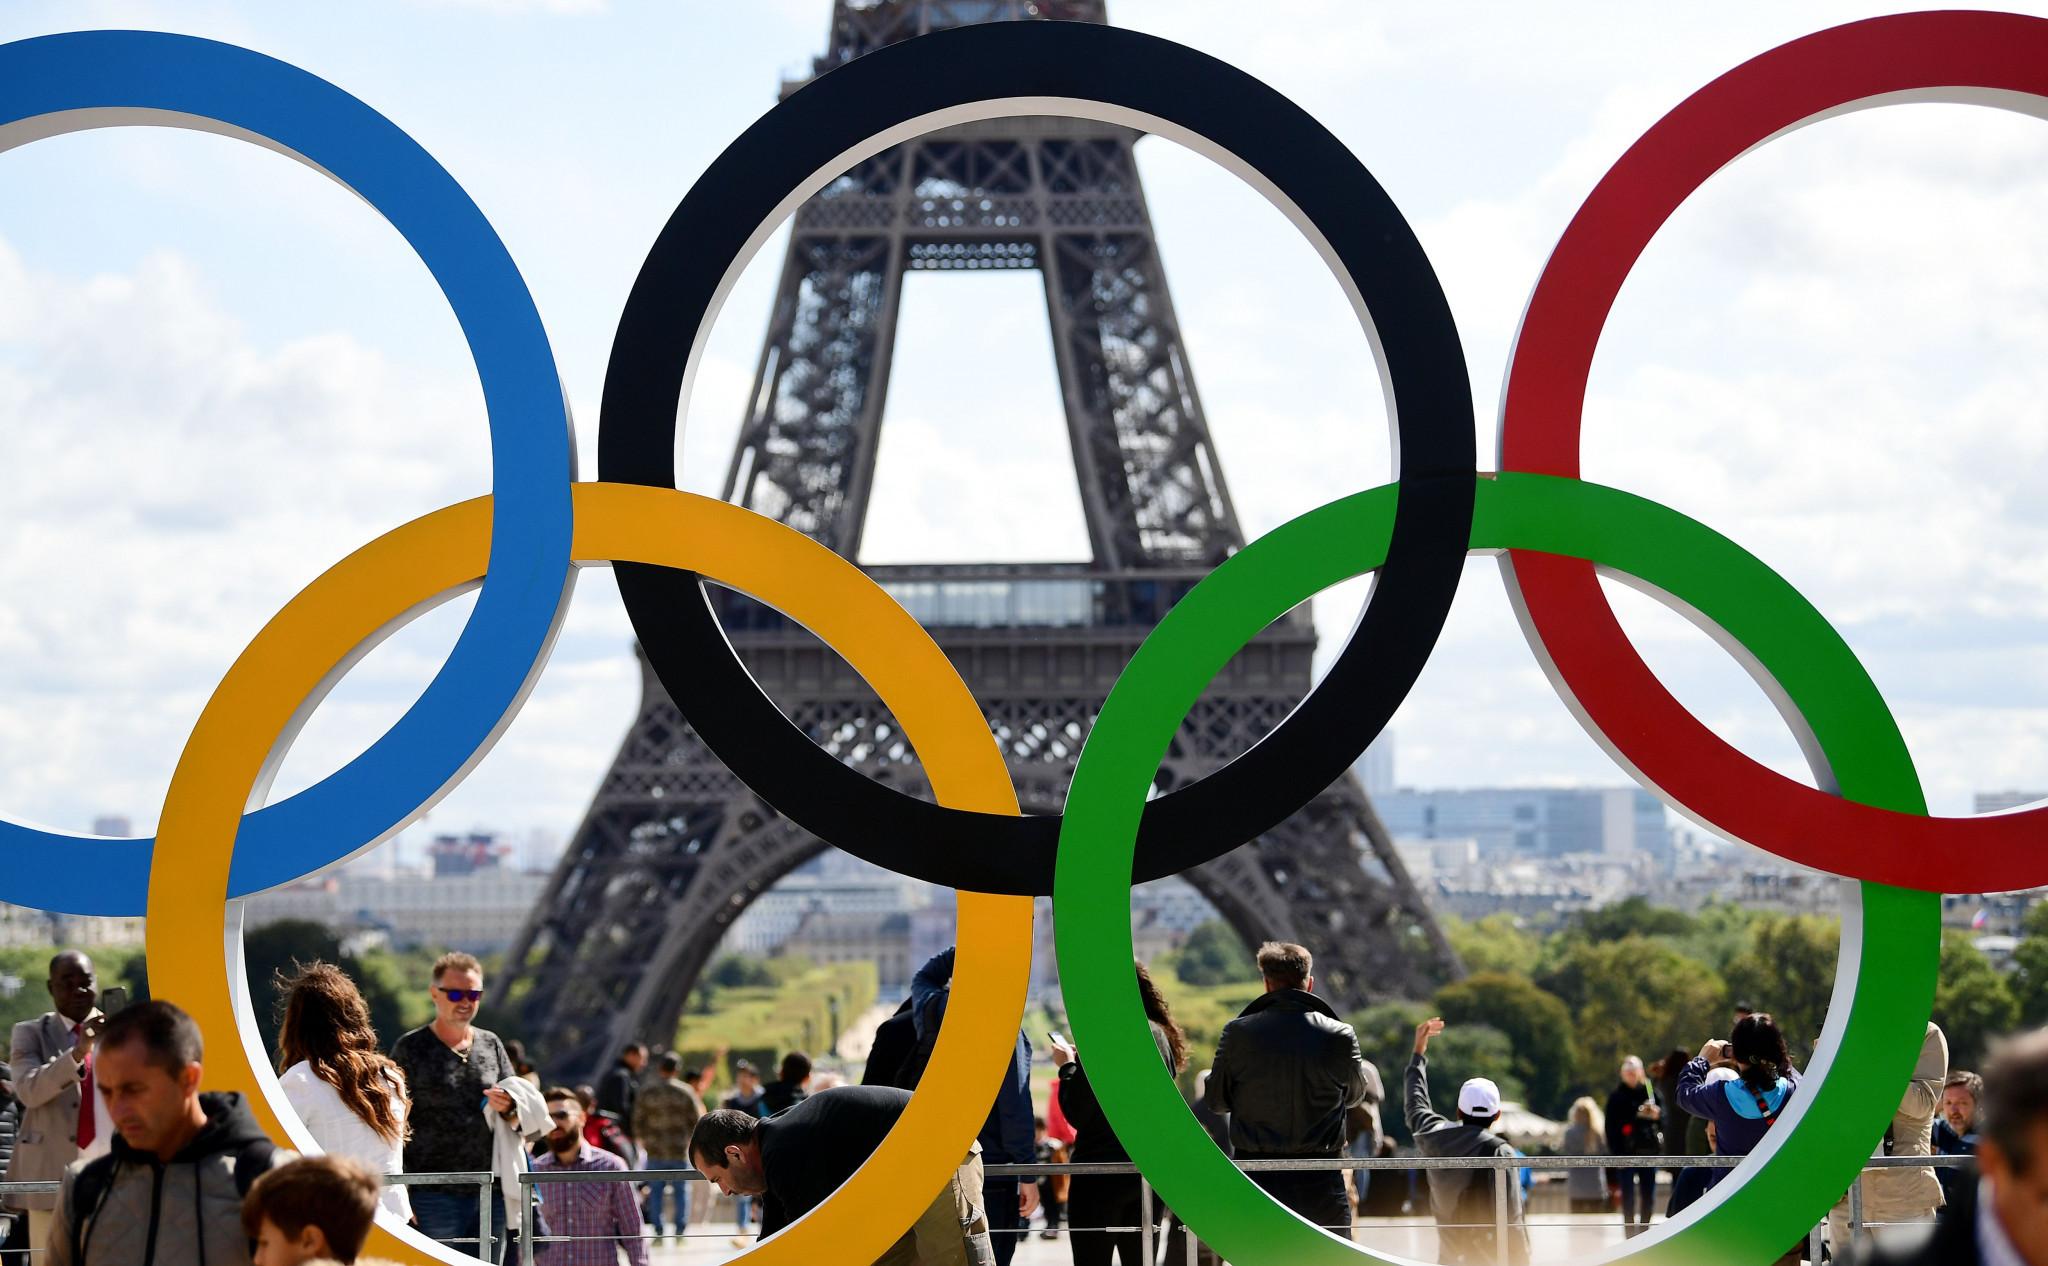 Paris 2024 presents new venue plan in bid to cut costs